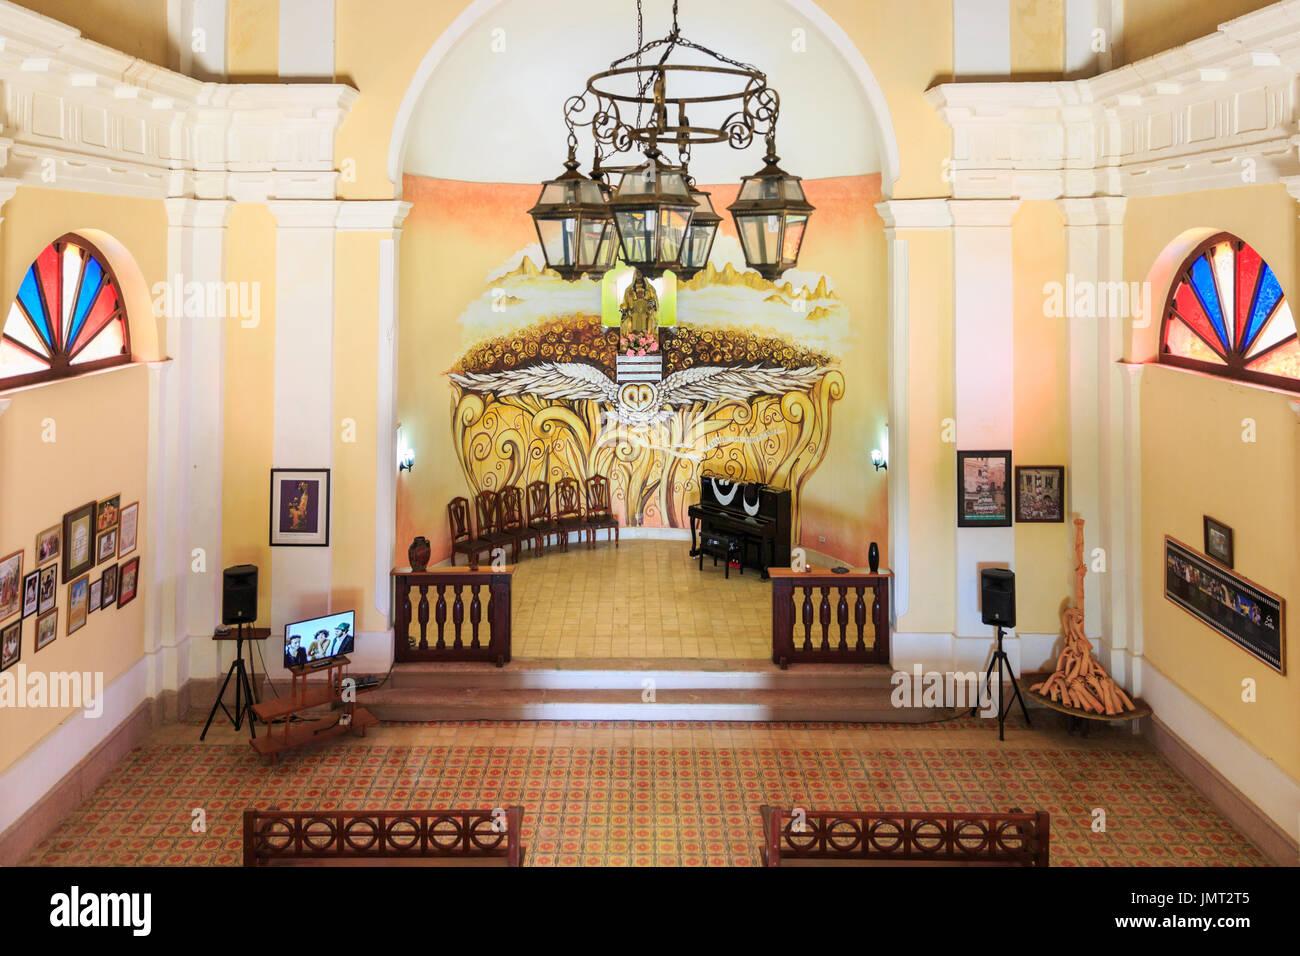 Ermita De Monserrate Iglesia Spanish Colonial Style Church Interior Altar And Nave In Matanzas Cuba